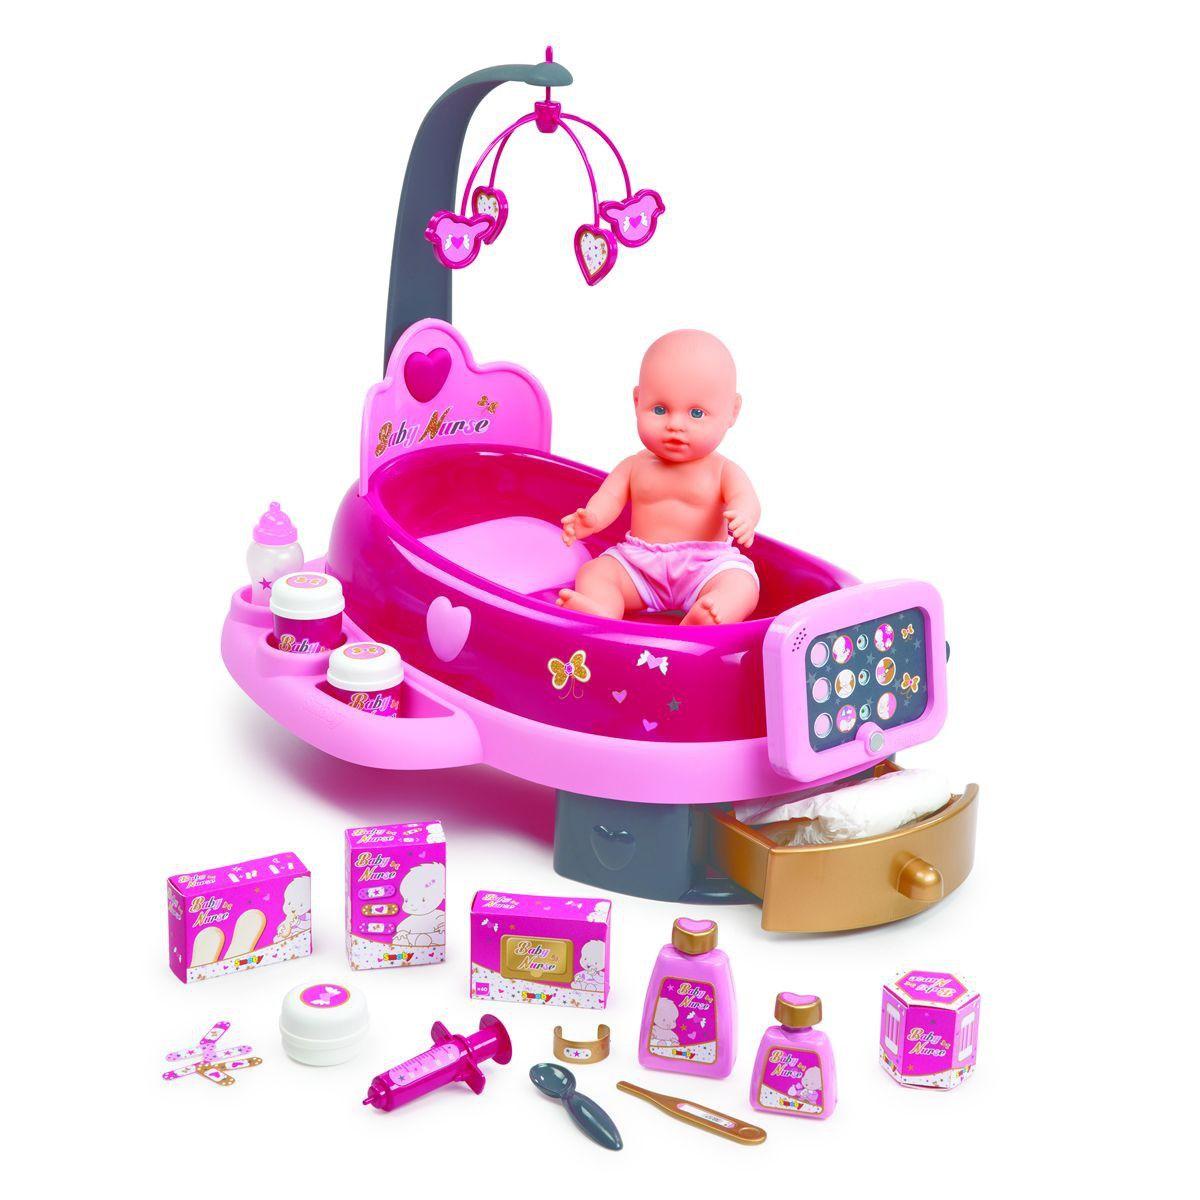 Nursery électronique Baby Nurse Nursing baby, Baby doll